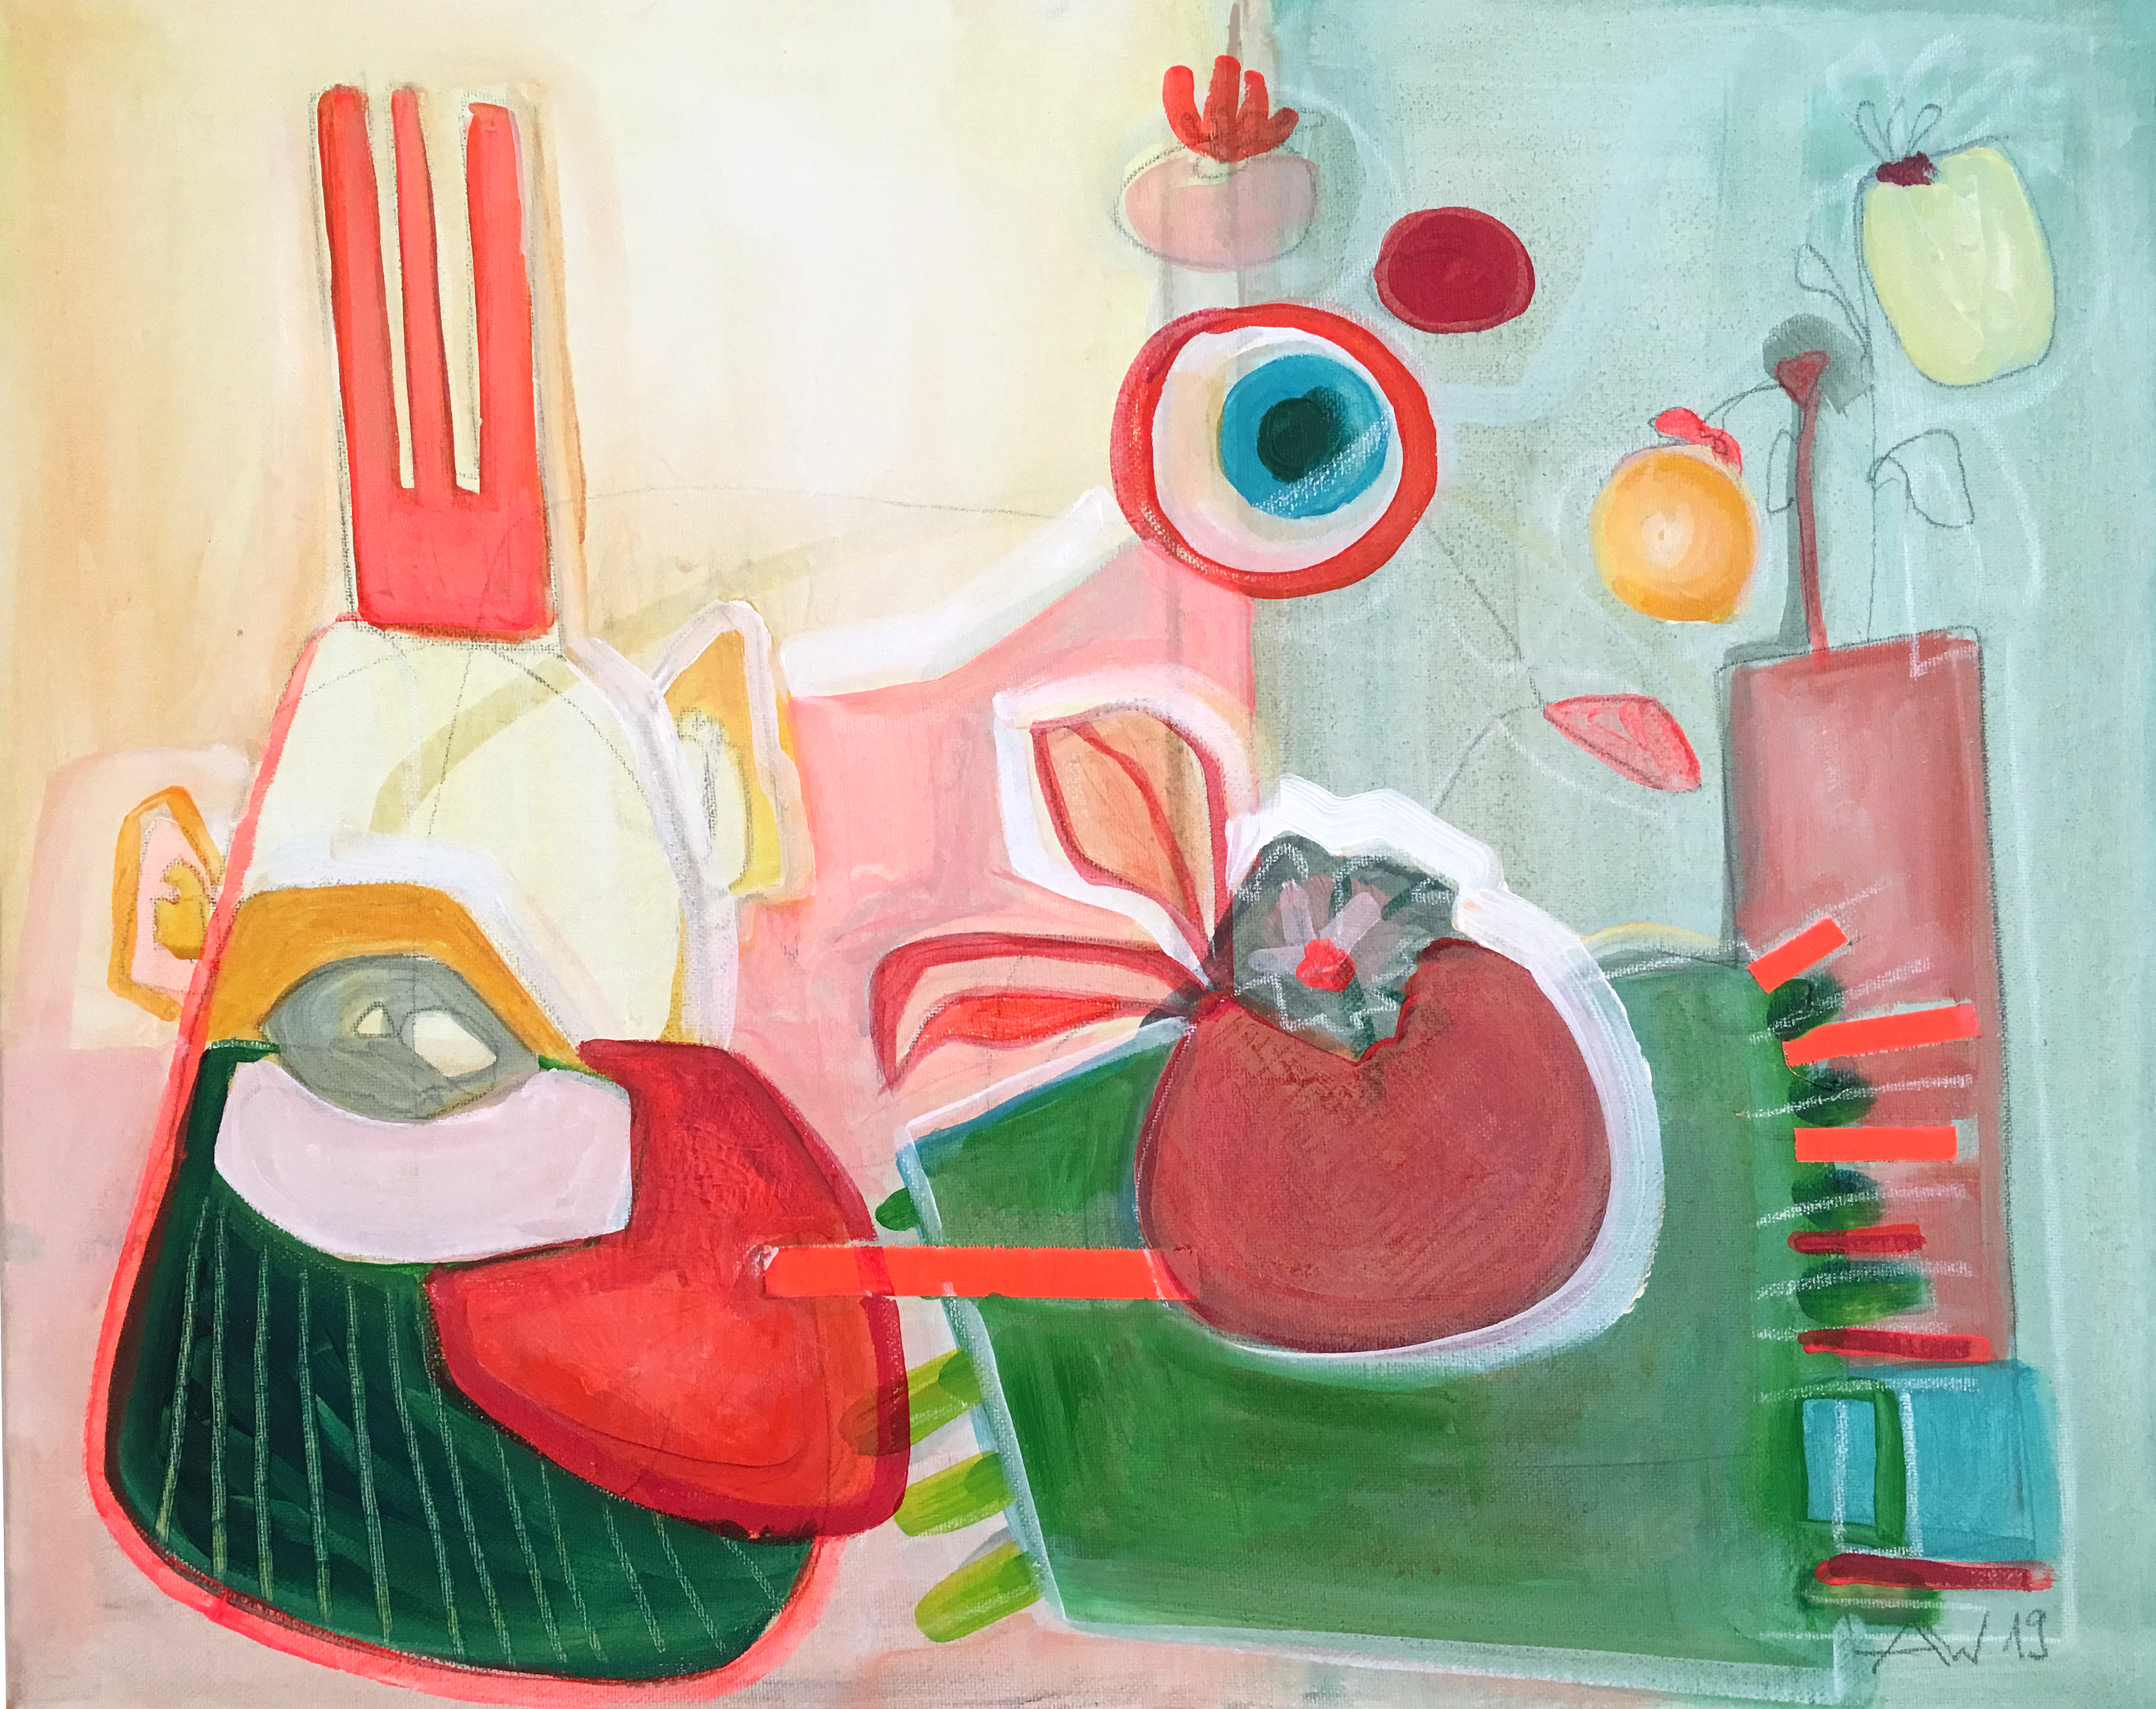 Stillleben mit König, Acryl auf Leinwand, 40x50cm, 2019